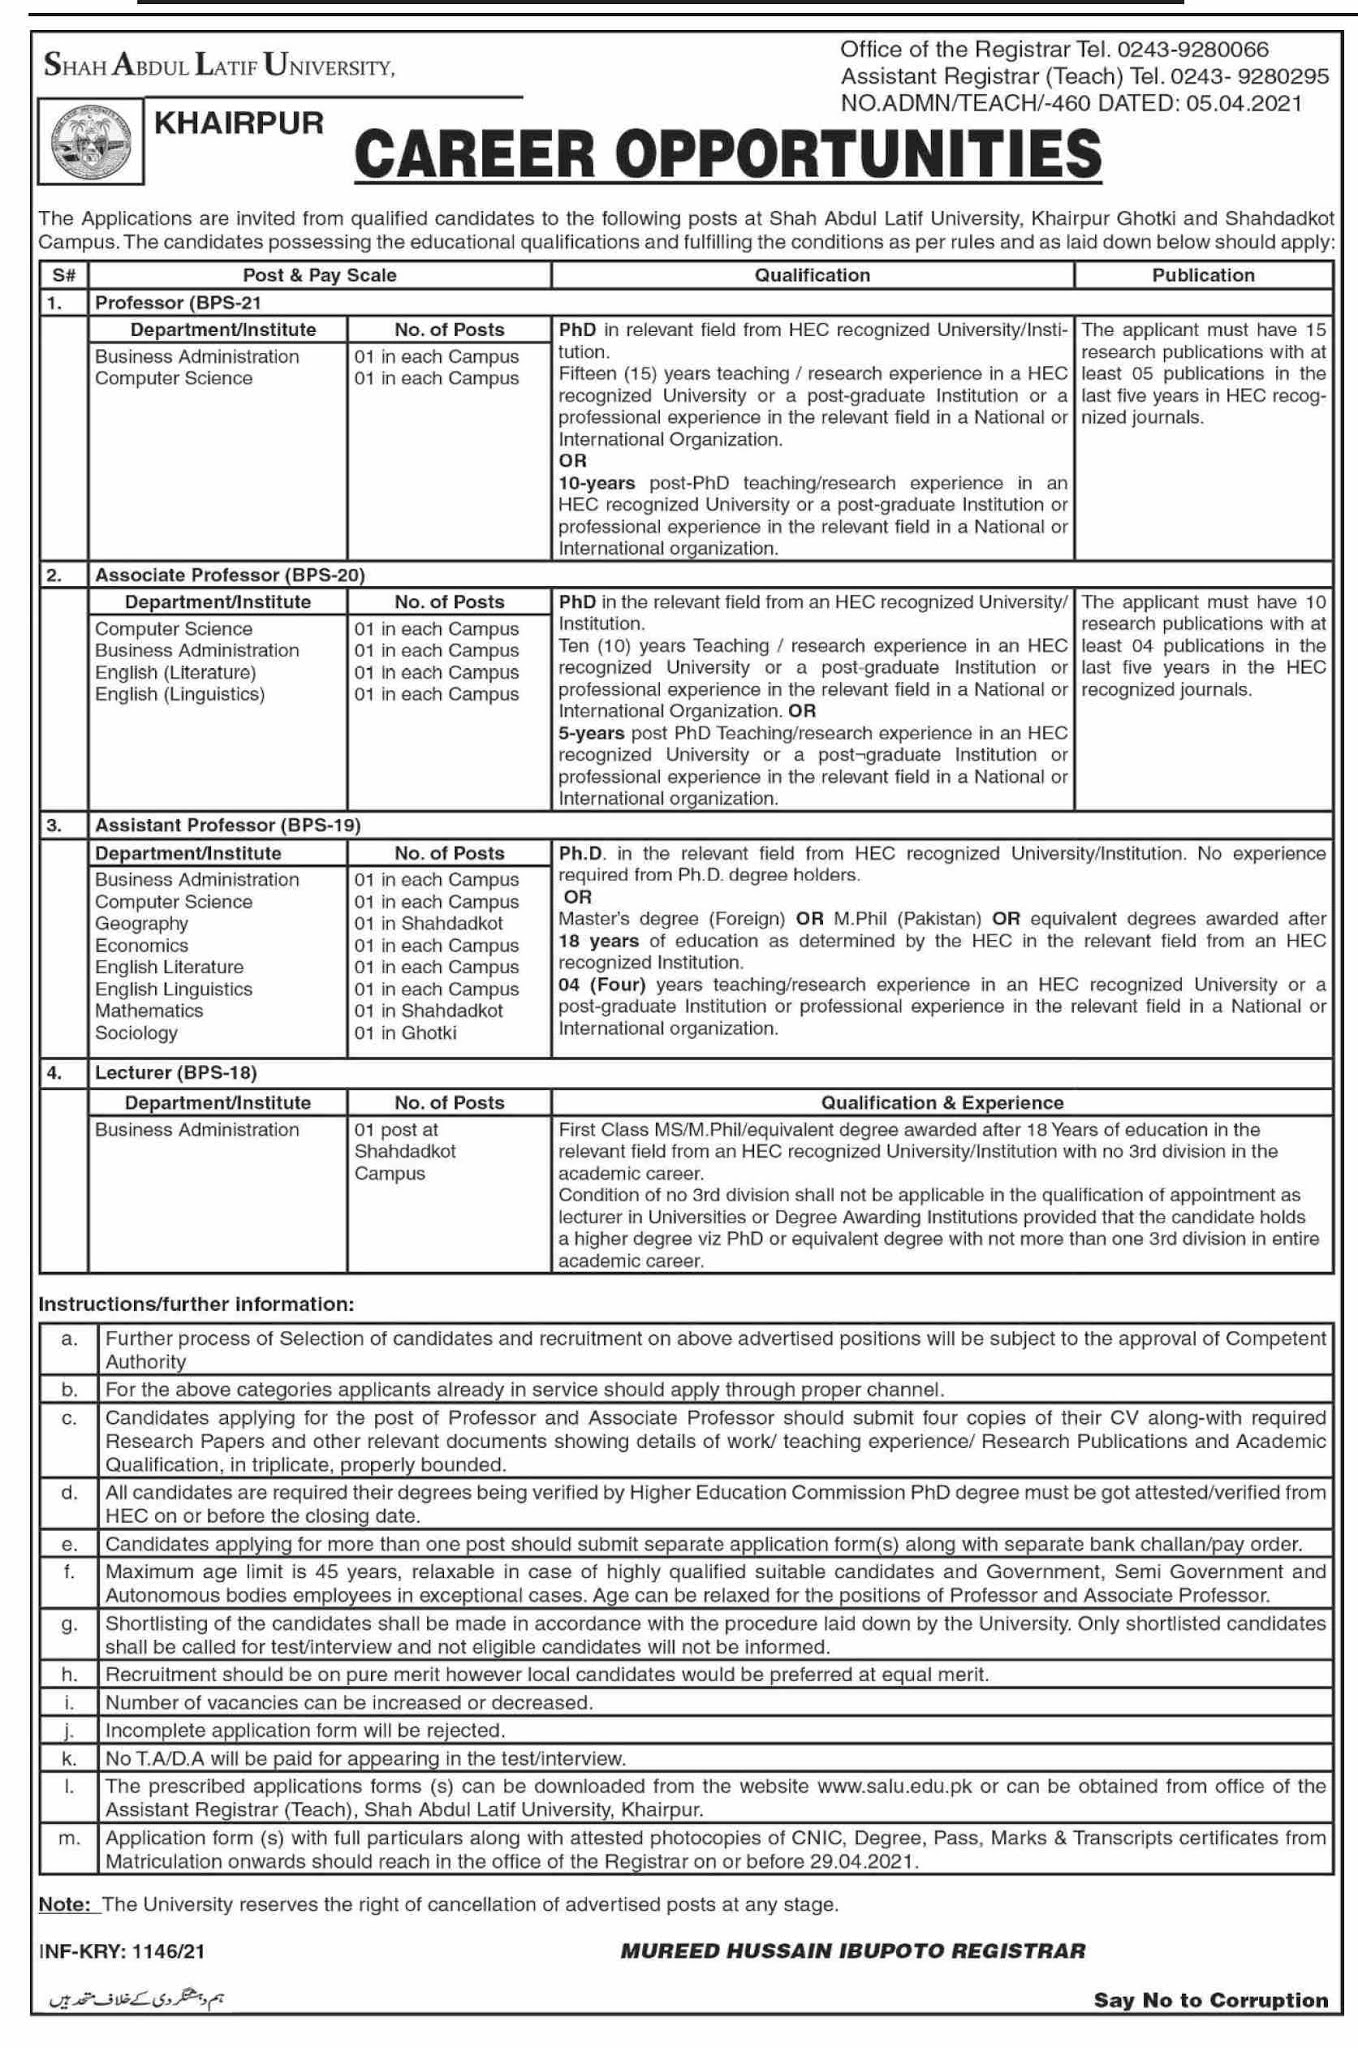 Shah Abdul Latif University Khairpur Teaching Jobs 2021 Advertisement